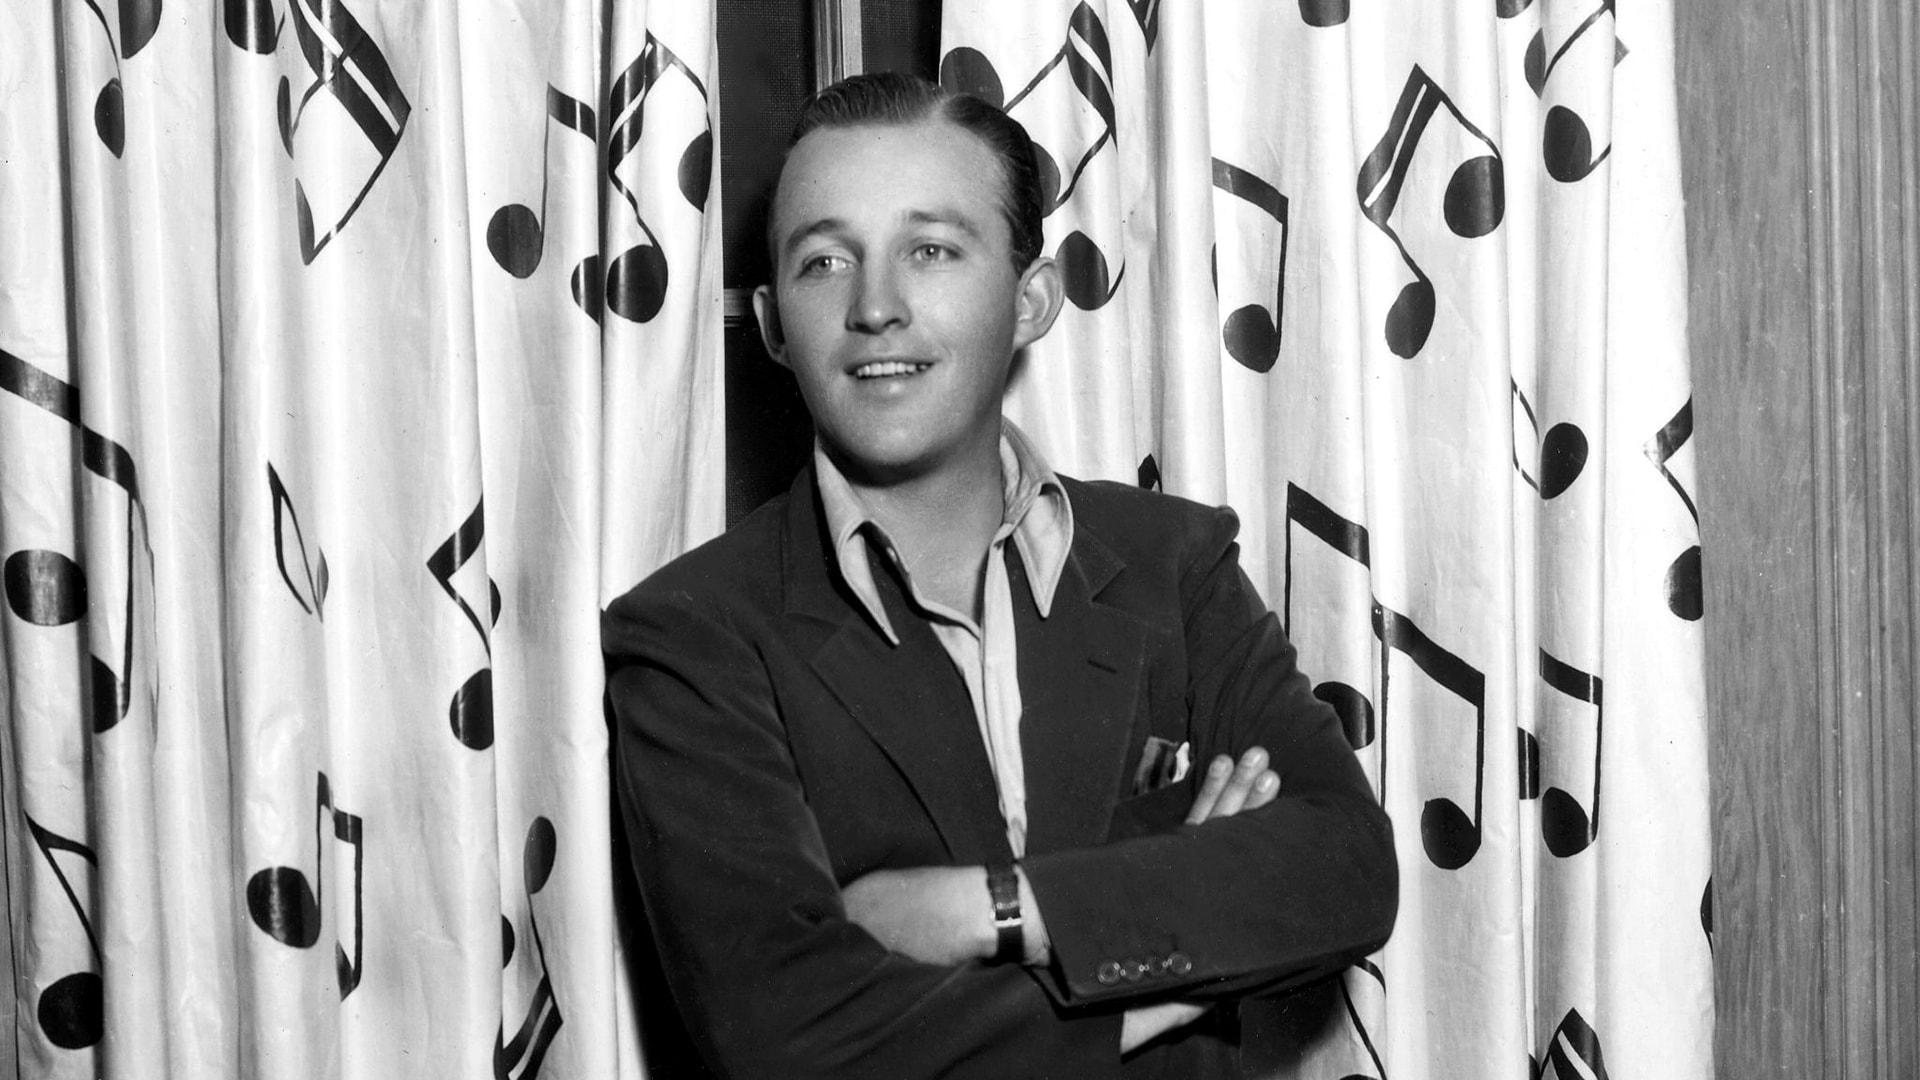 Bing Crosby Full hd wallpapers